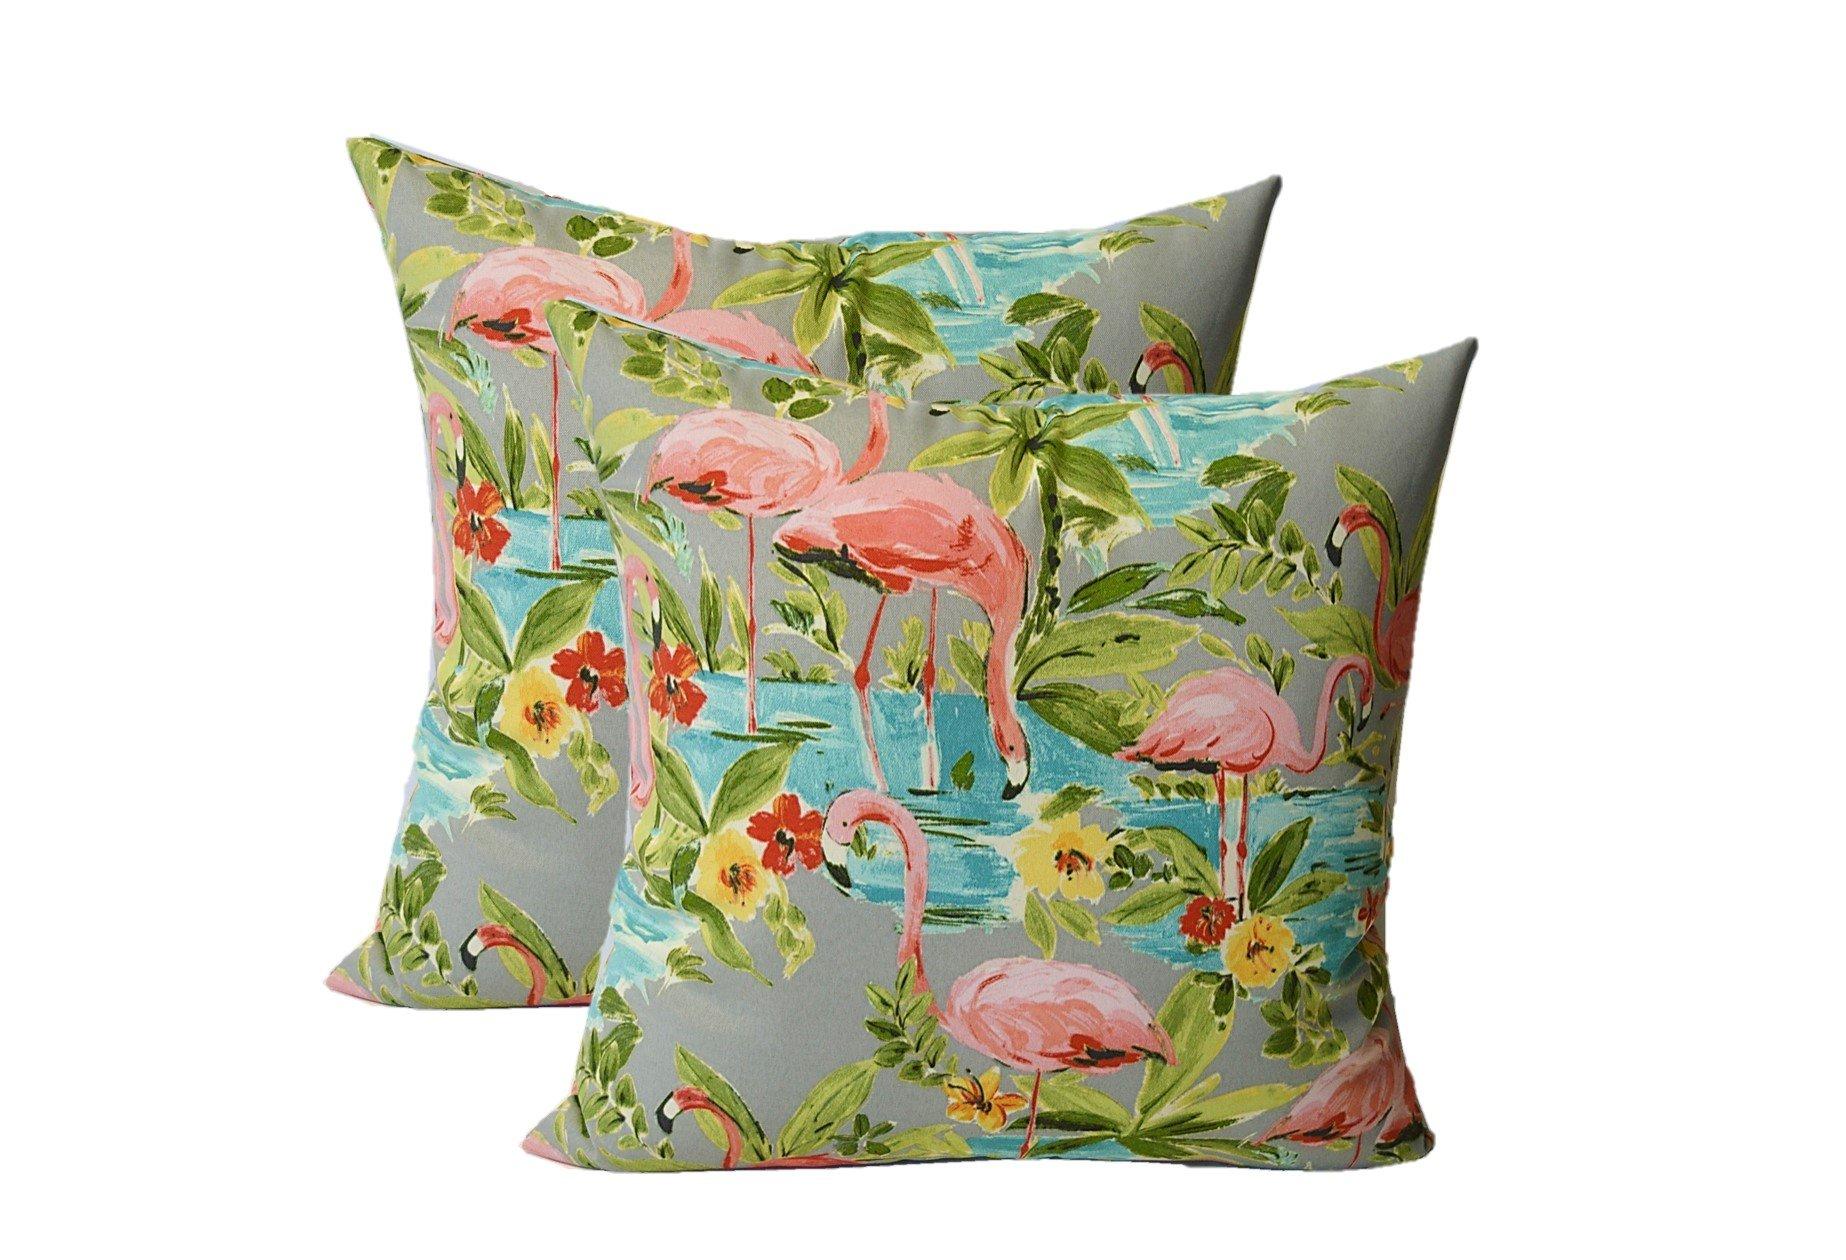 Set of 2 - Indoor / Outdoor Square Decorative Throw / Toss Pillows - Waverly Elegant Tropical Platinum Flamingo - Grey, Aqua, Green, Coral - Choose Size (17'')